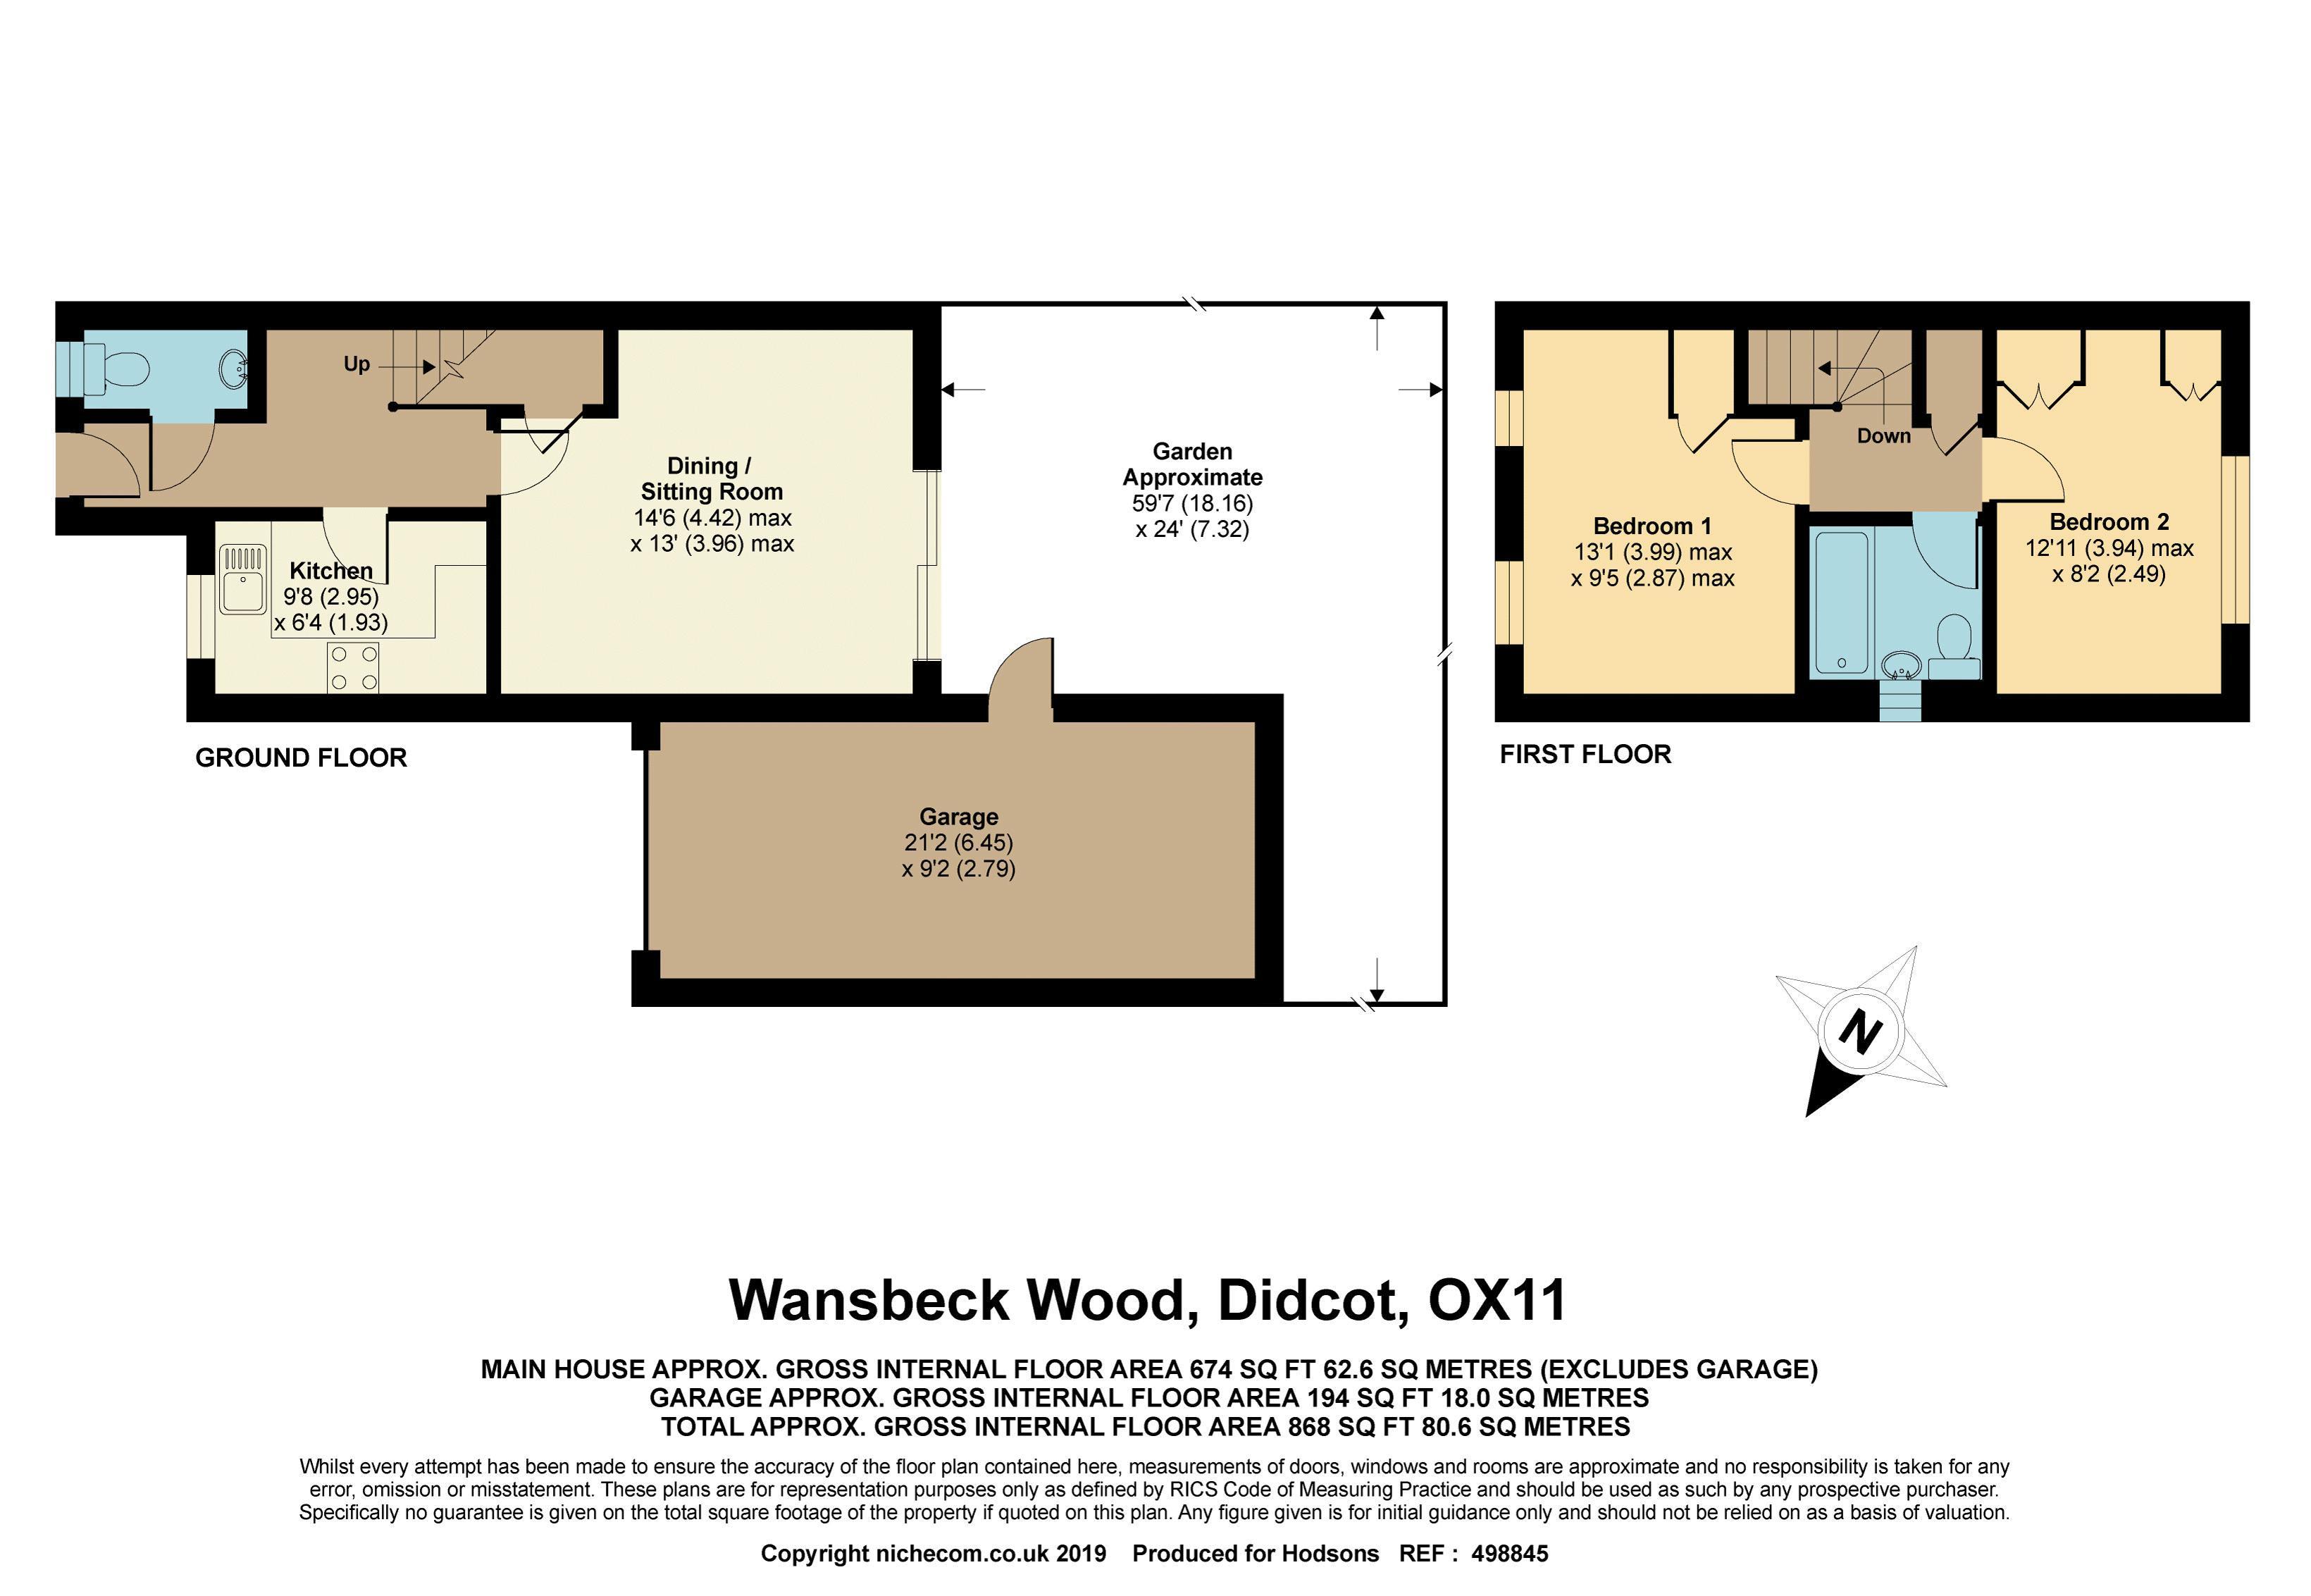 Wansbeck Wood